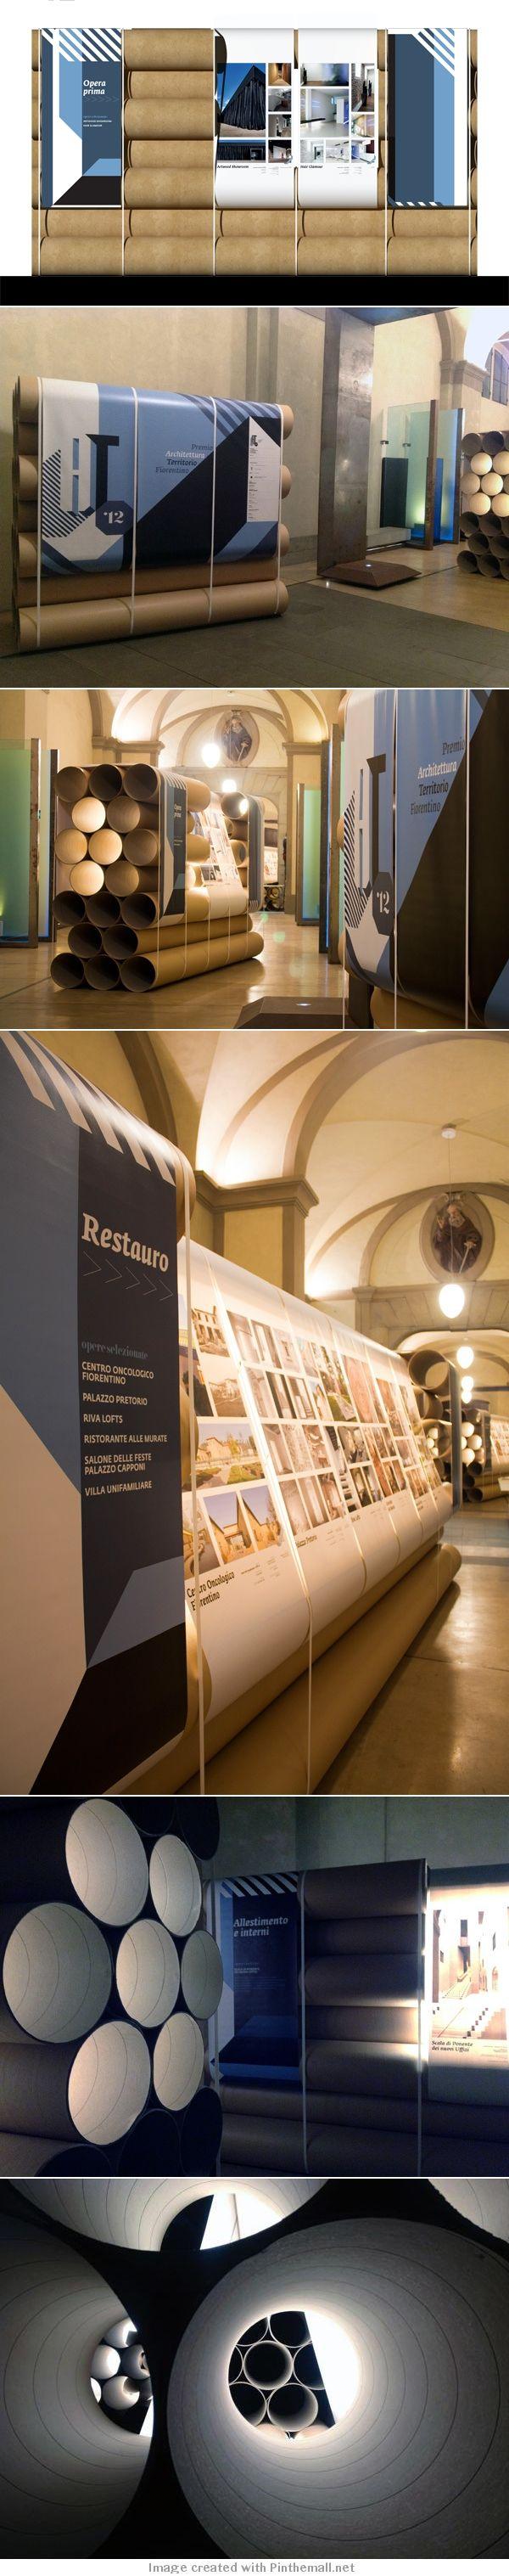 AT'12 exhibition. / #architecture #art #direction #exhibition #design